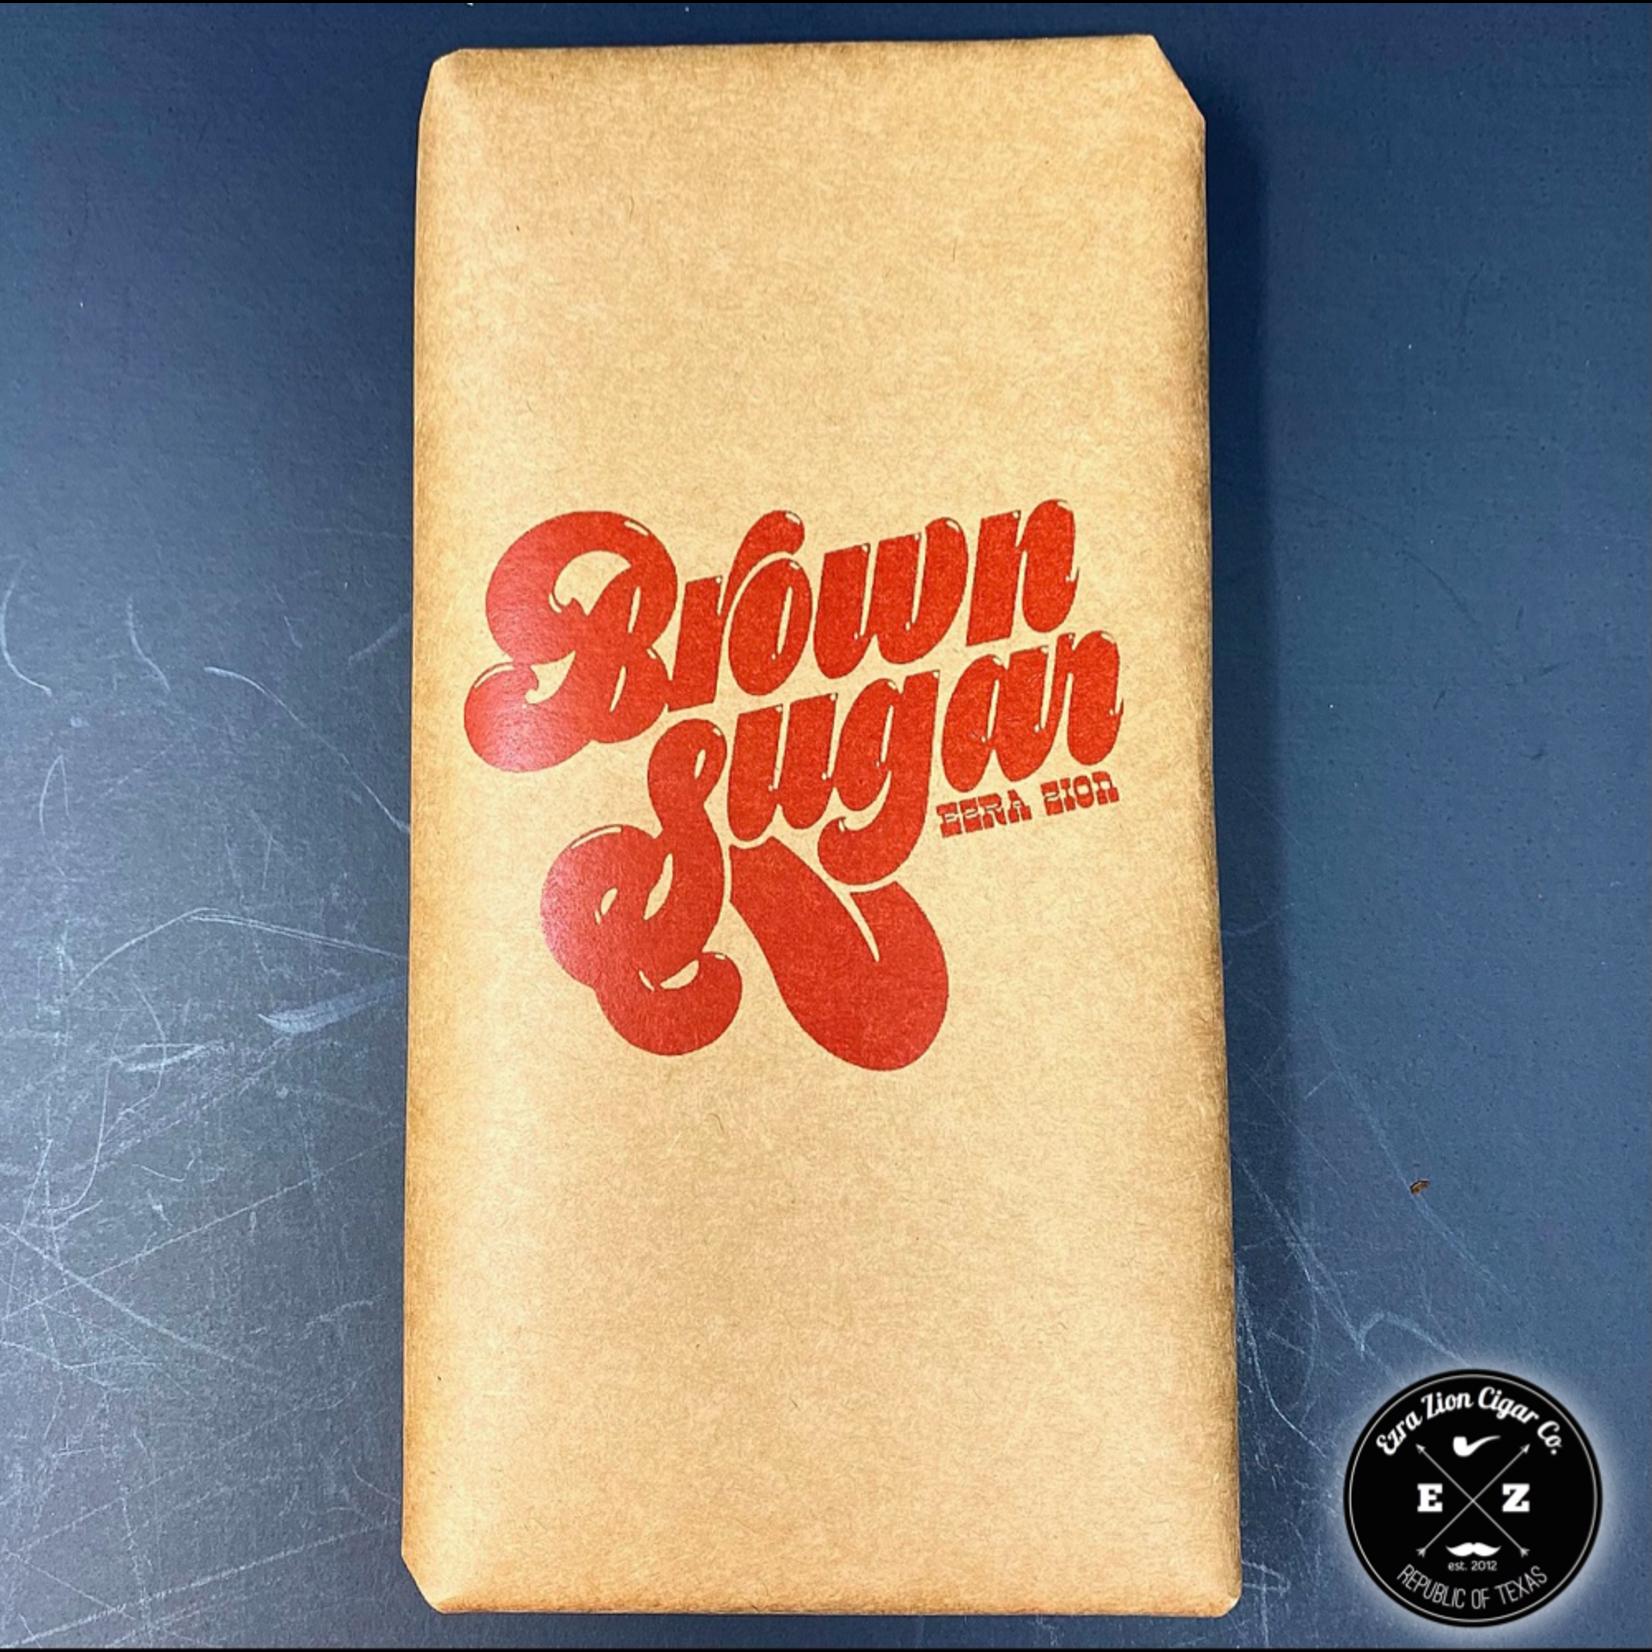 Ezra Zion Cigars Brown Sugar Ltd.